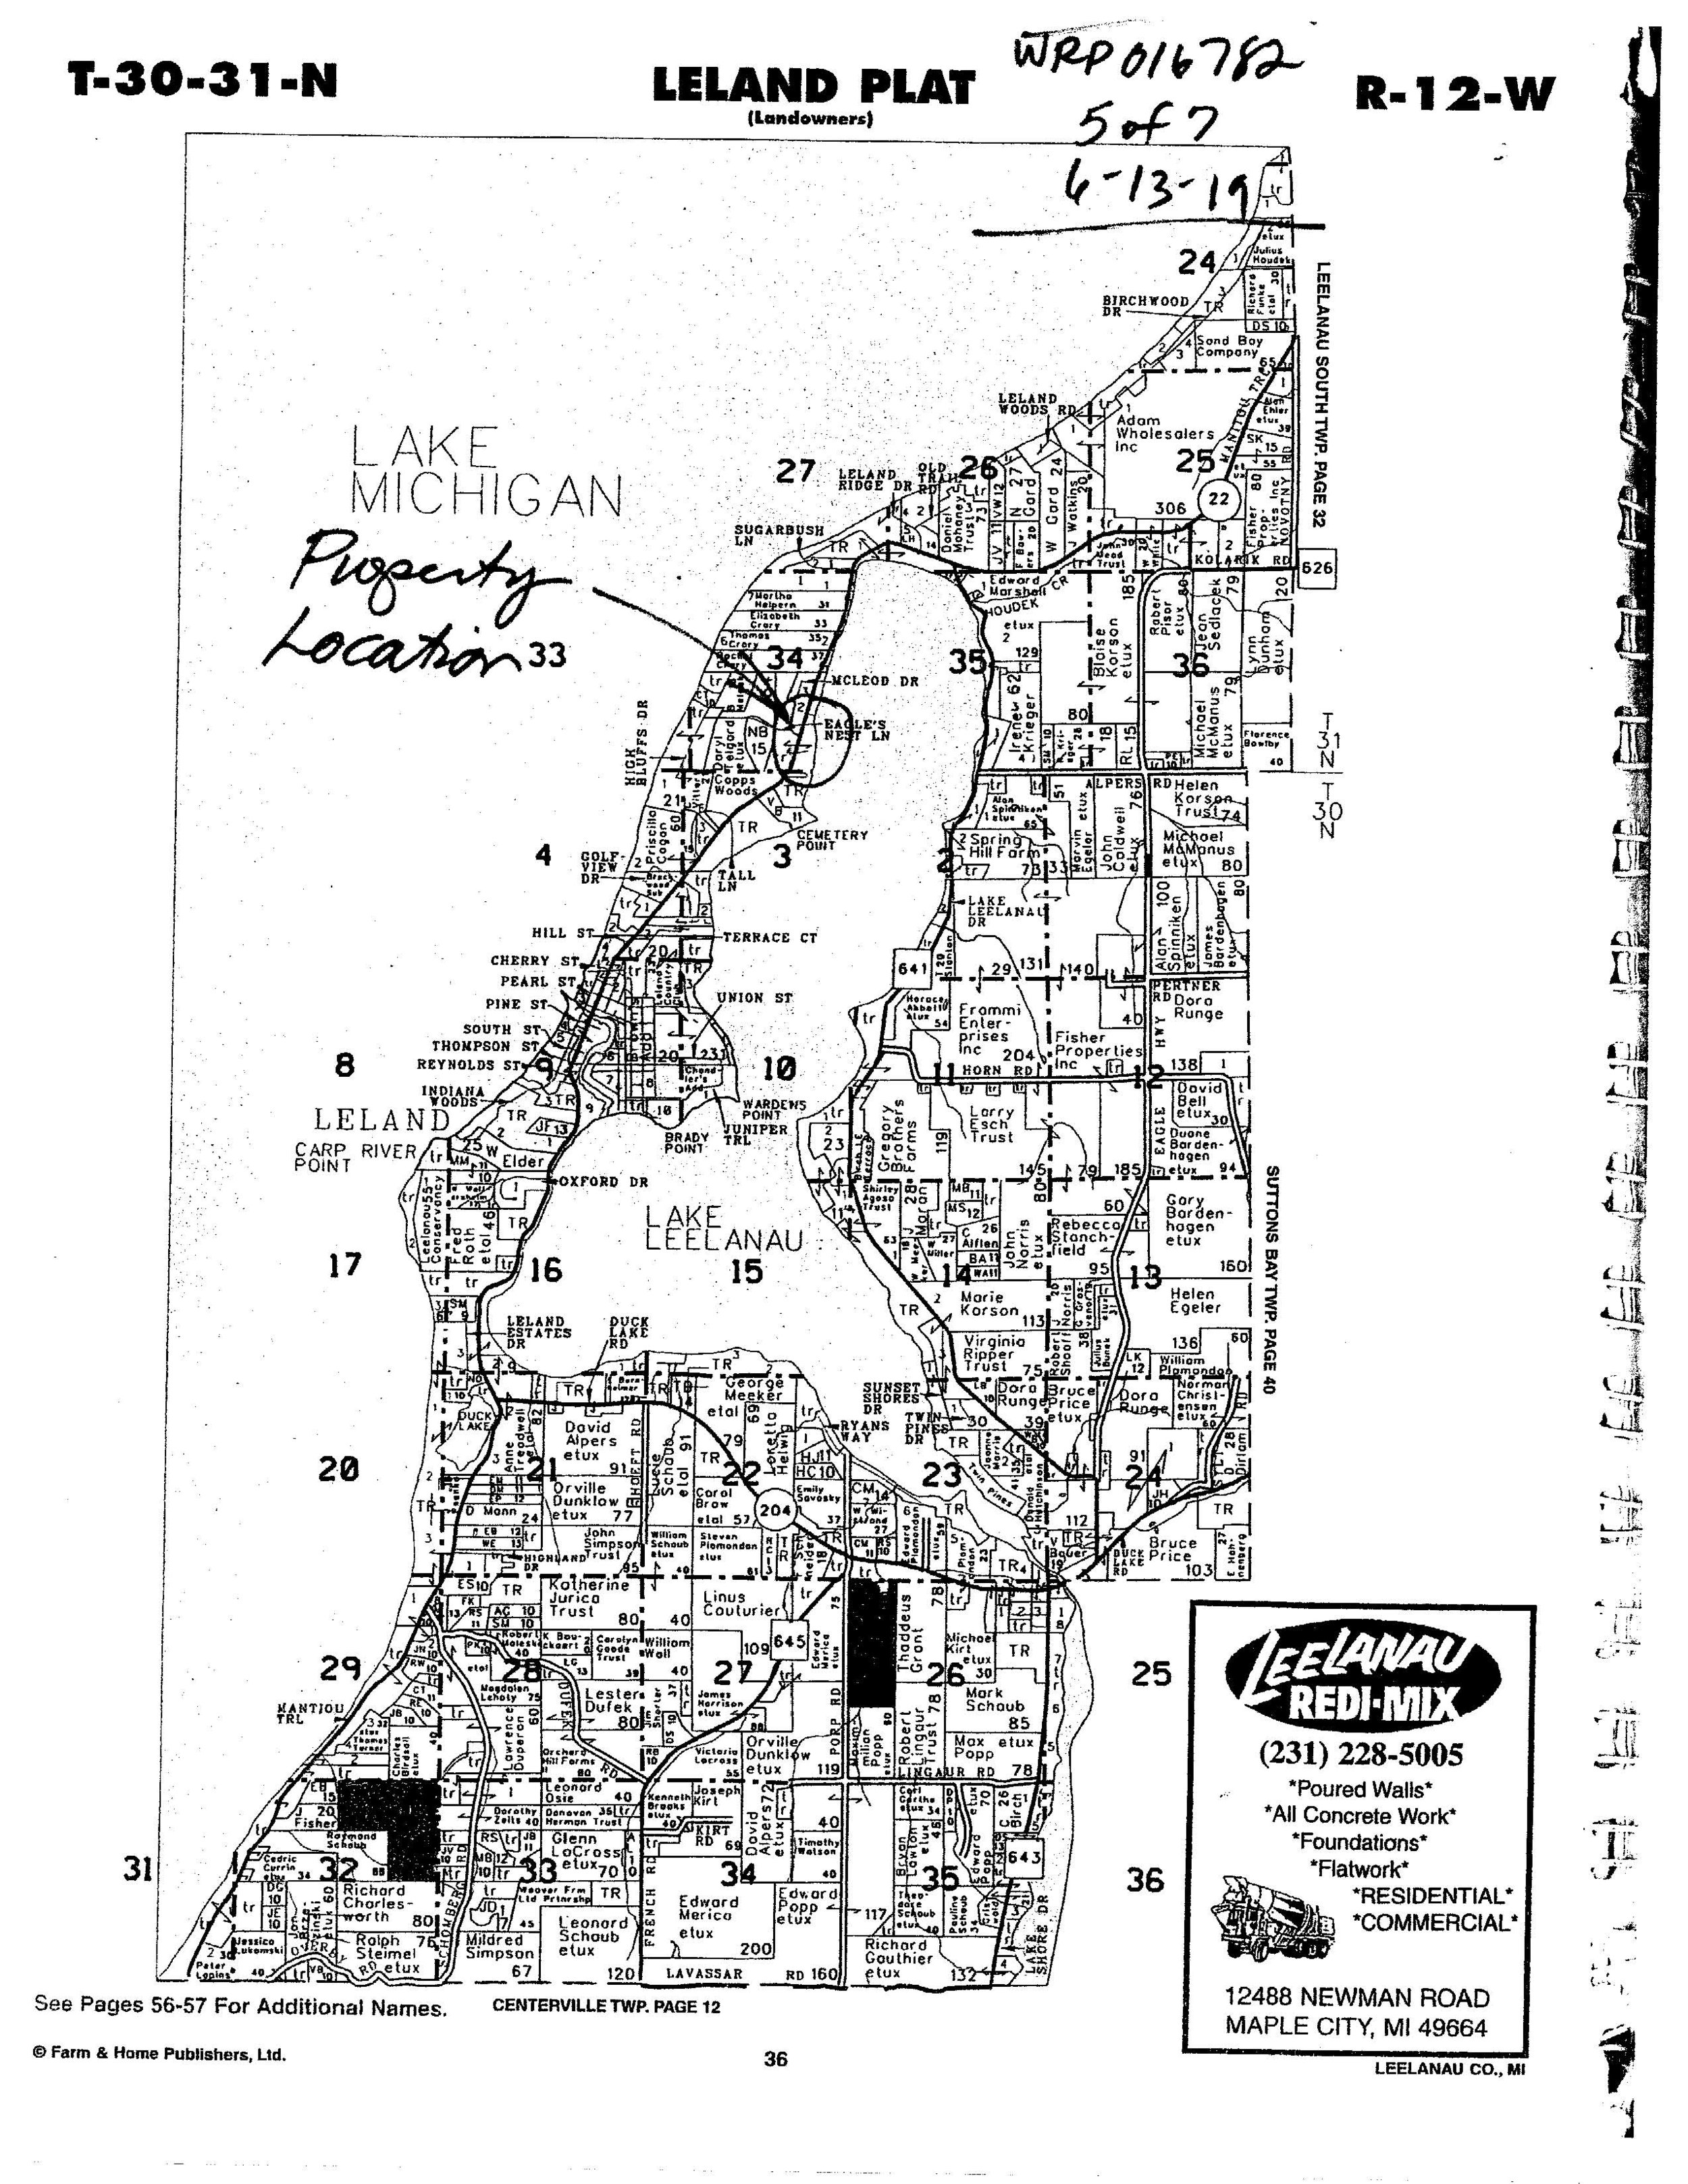 4388 N Manitou Trail, Leland - Marketing packet by Oltersdorf Realty LLC (34).jpg